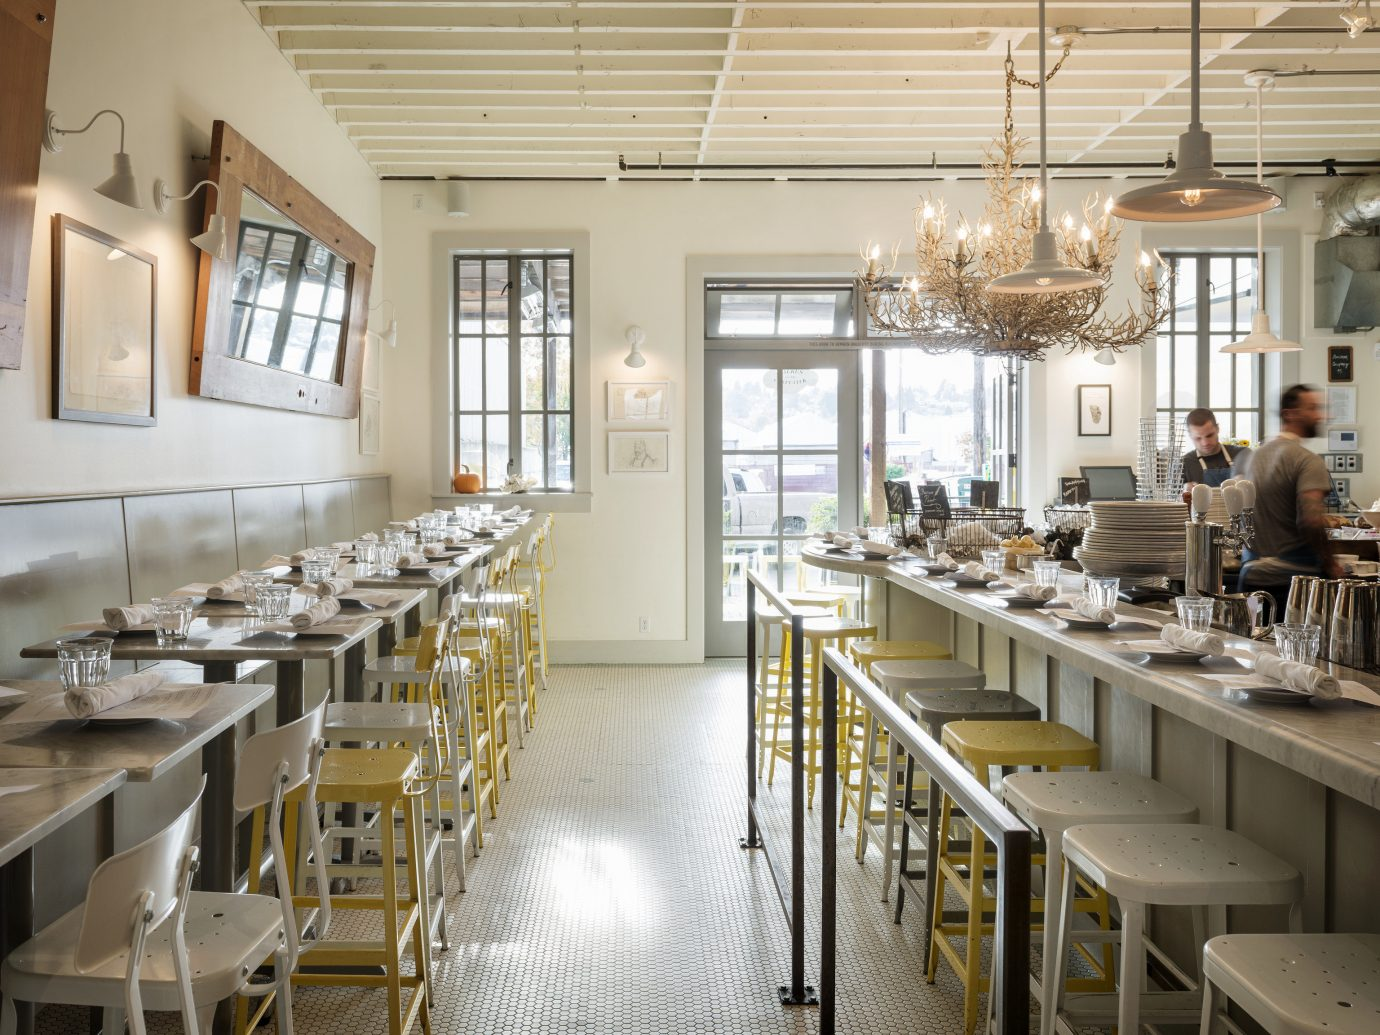 Food + Drink indoor table window Kitchen interior design restaurant Dining dining room counter lots area